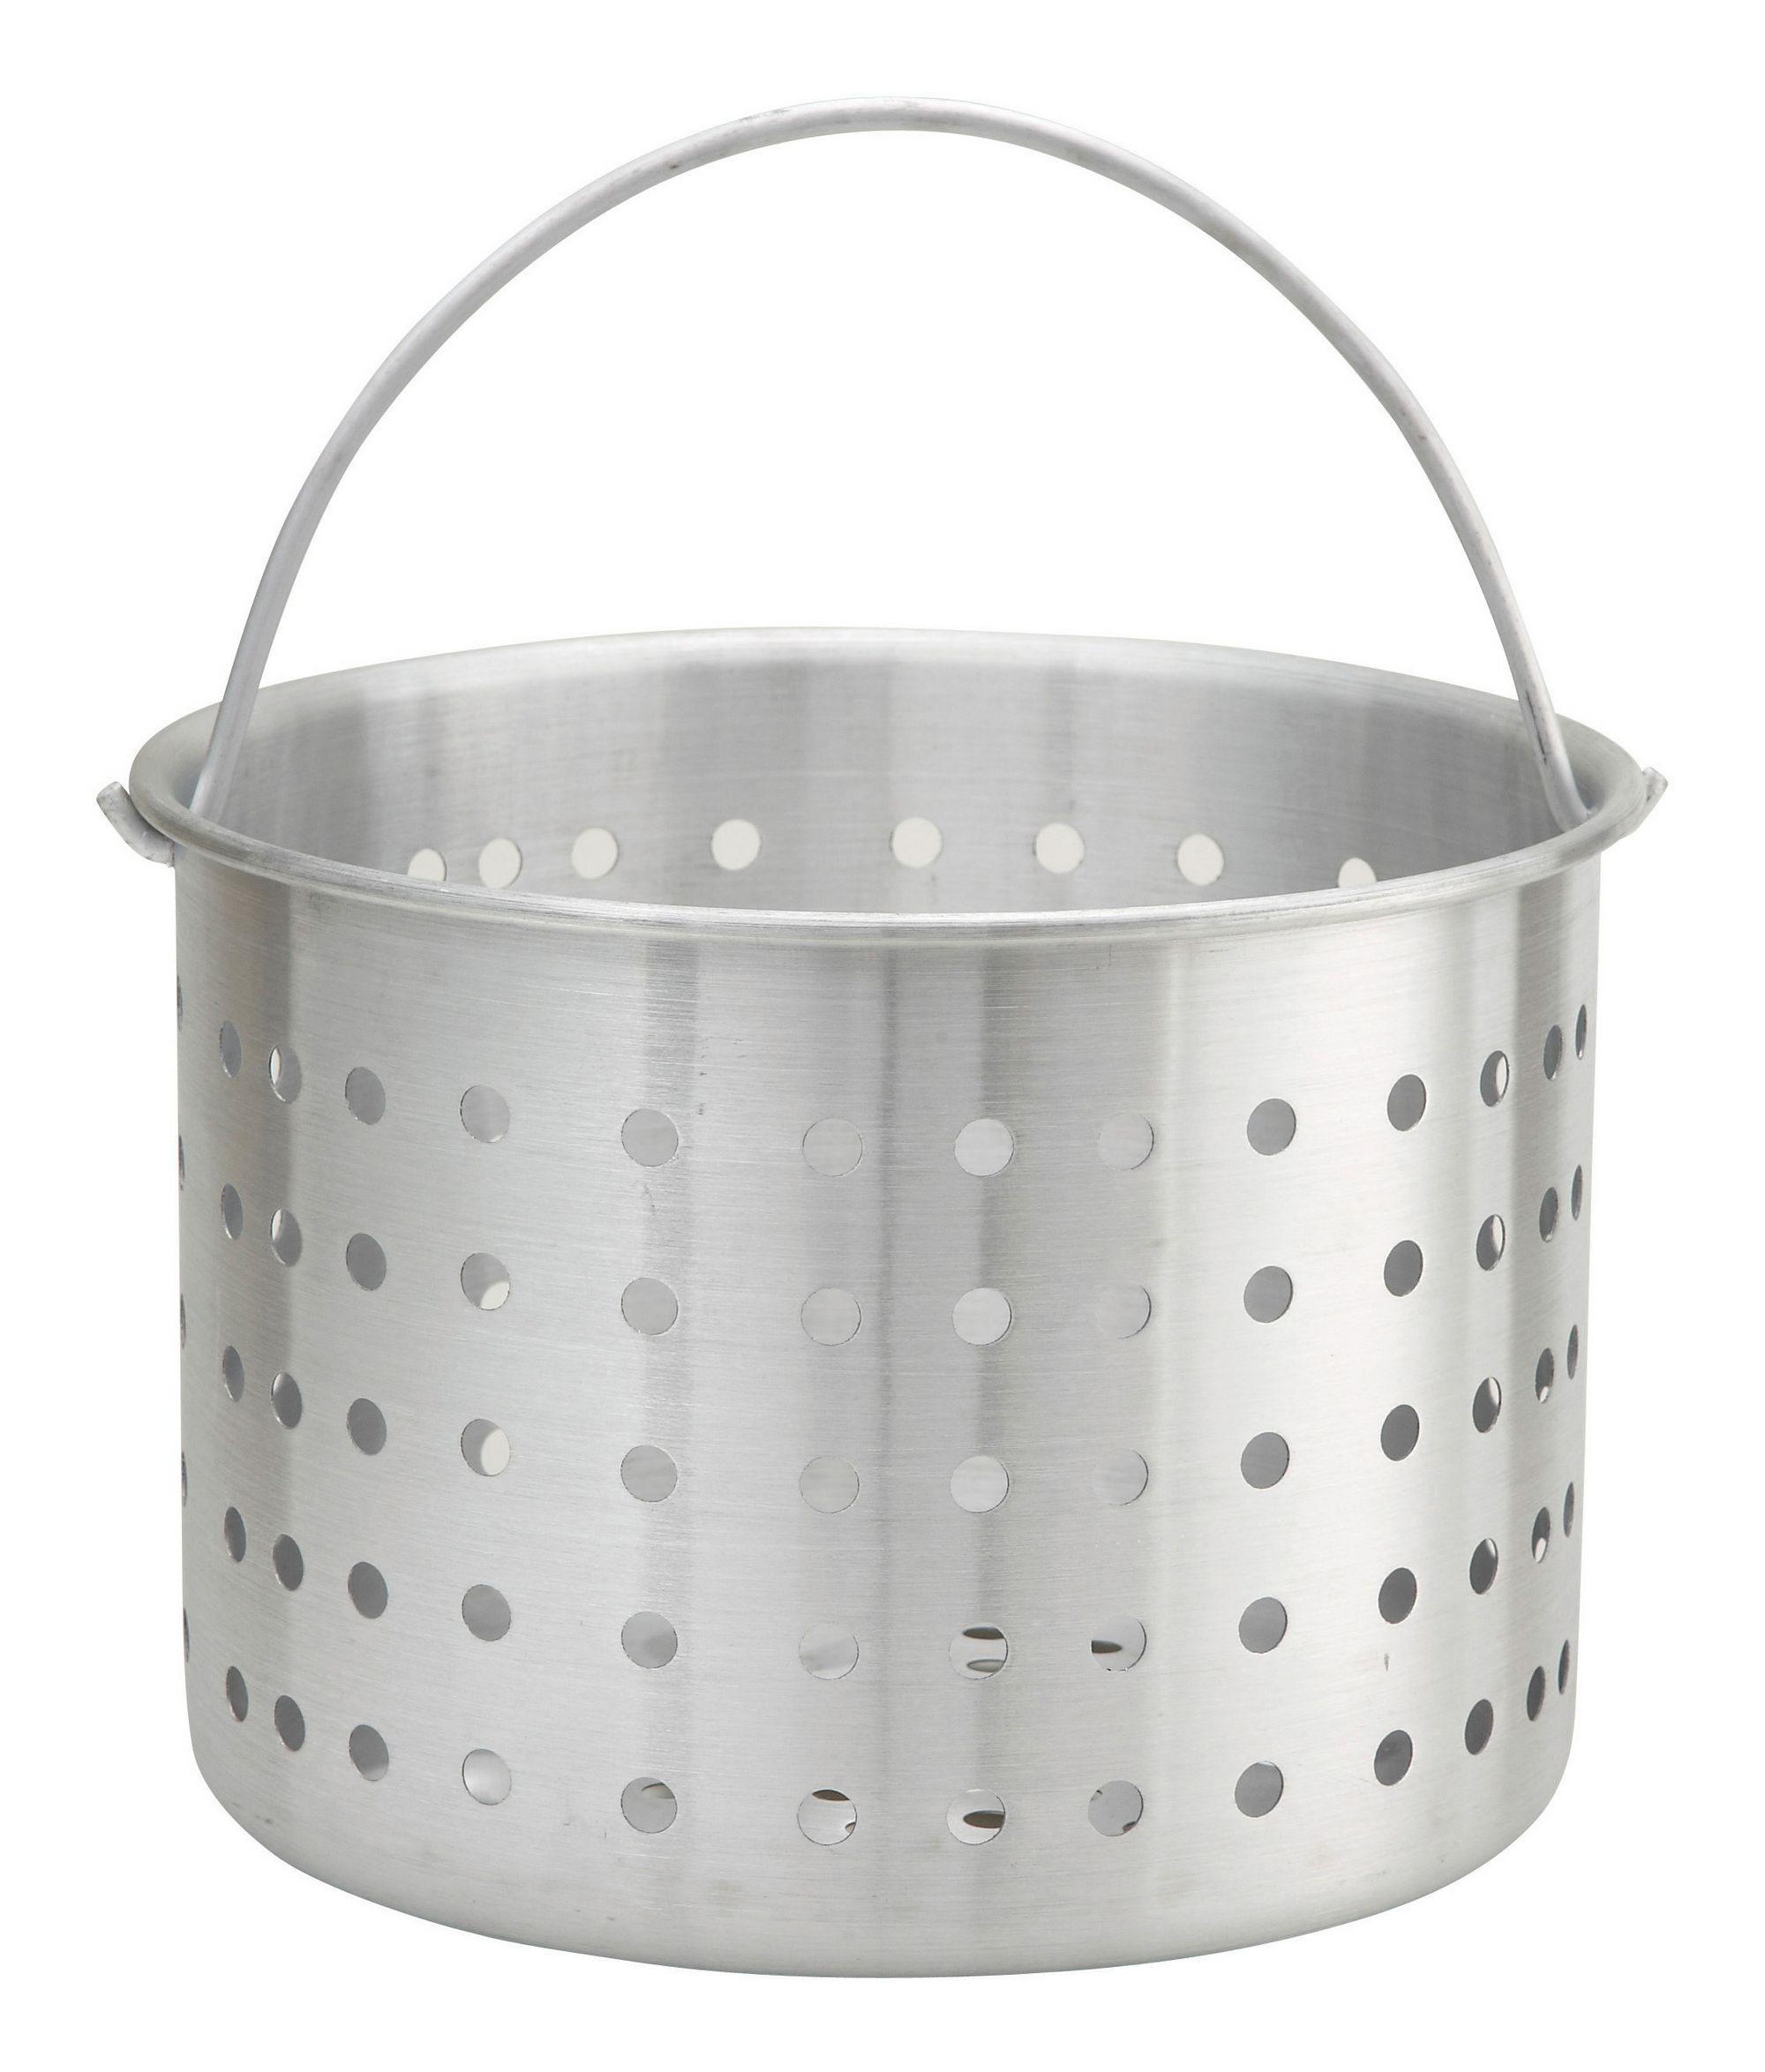 Winco ALSB-40 Aluminum Steamer Basket 40 Qt.